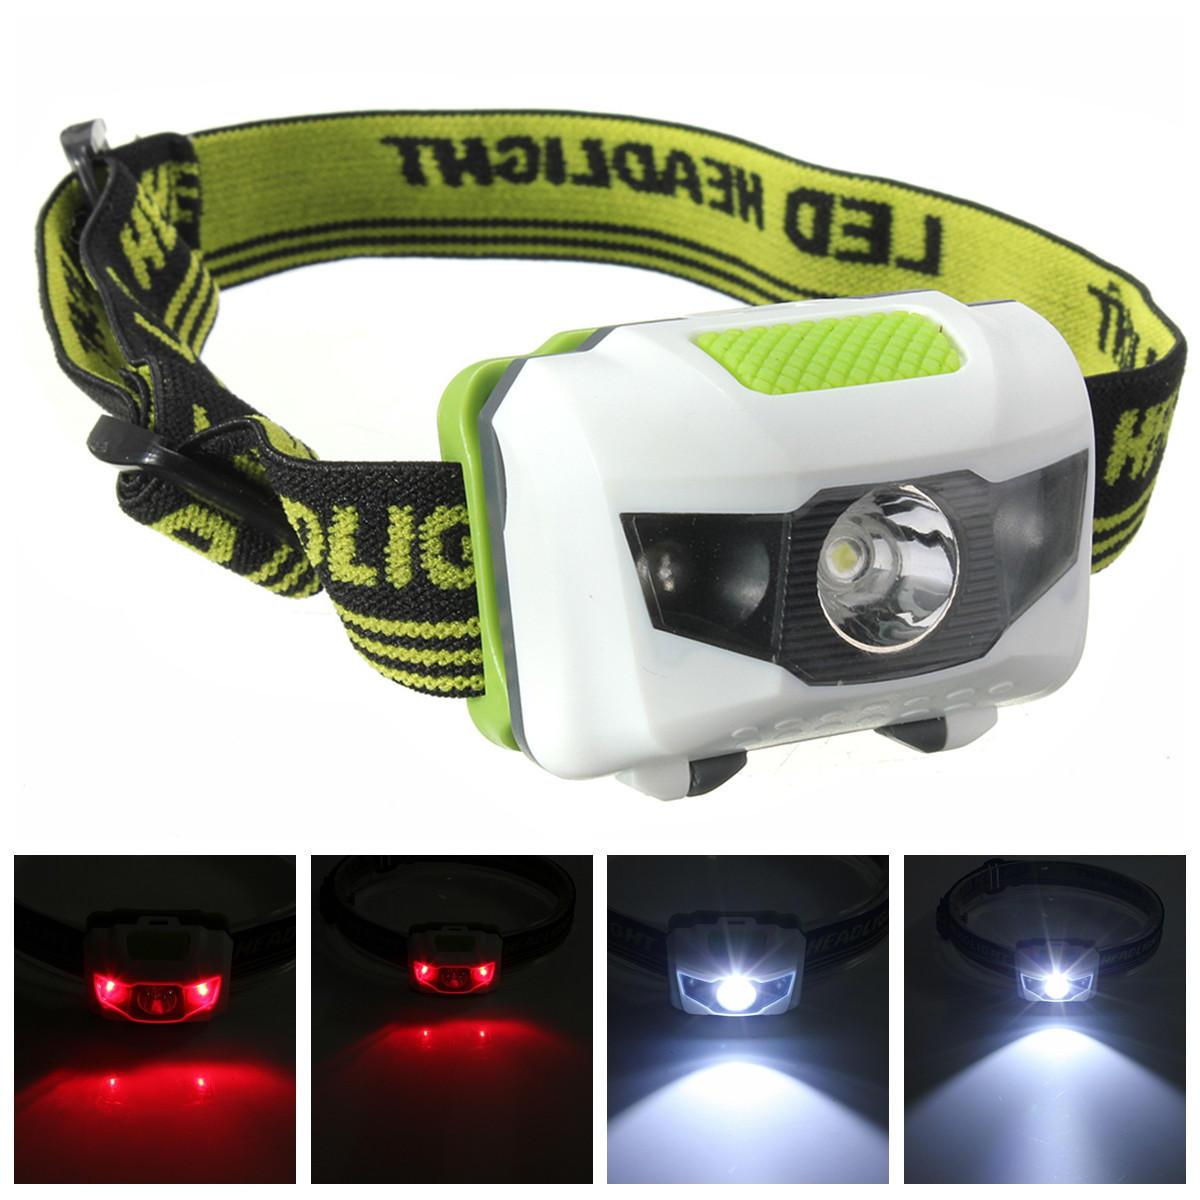 Linterna frontal LED XANES de 1200 Lúmenes 4 Modos R3+2LED